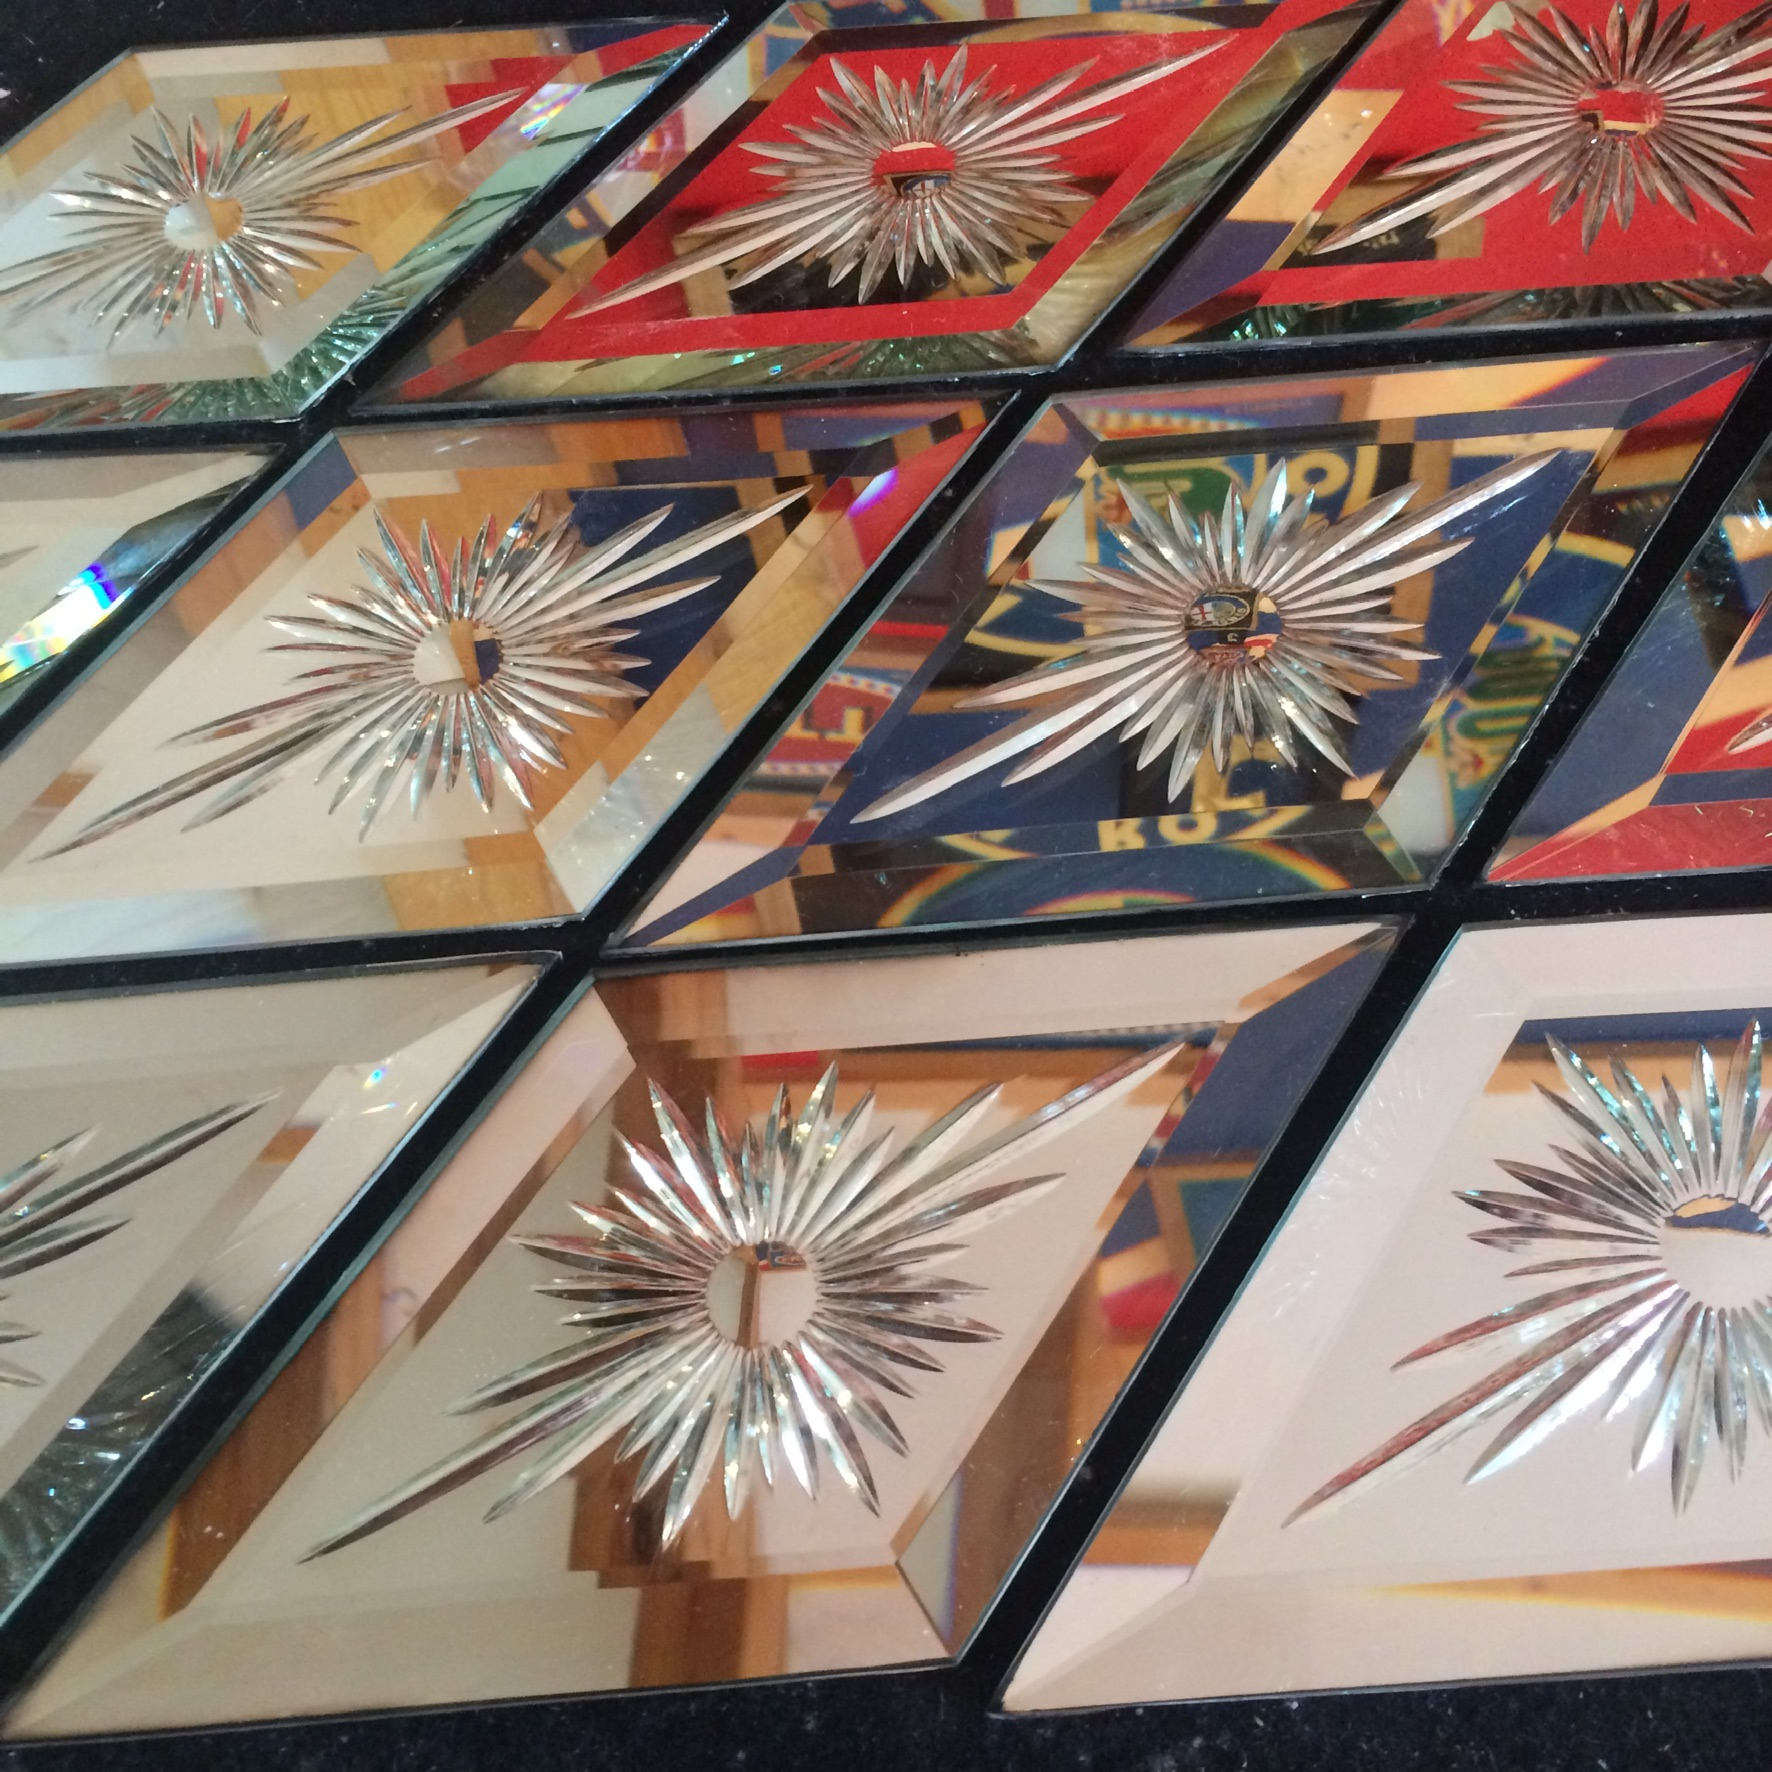 Brilliant-cut glory star mirrors for vintage funfair